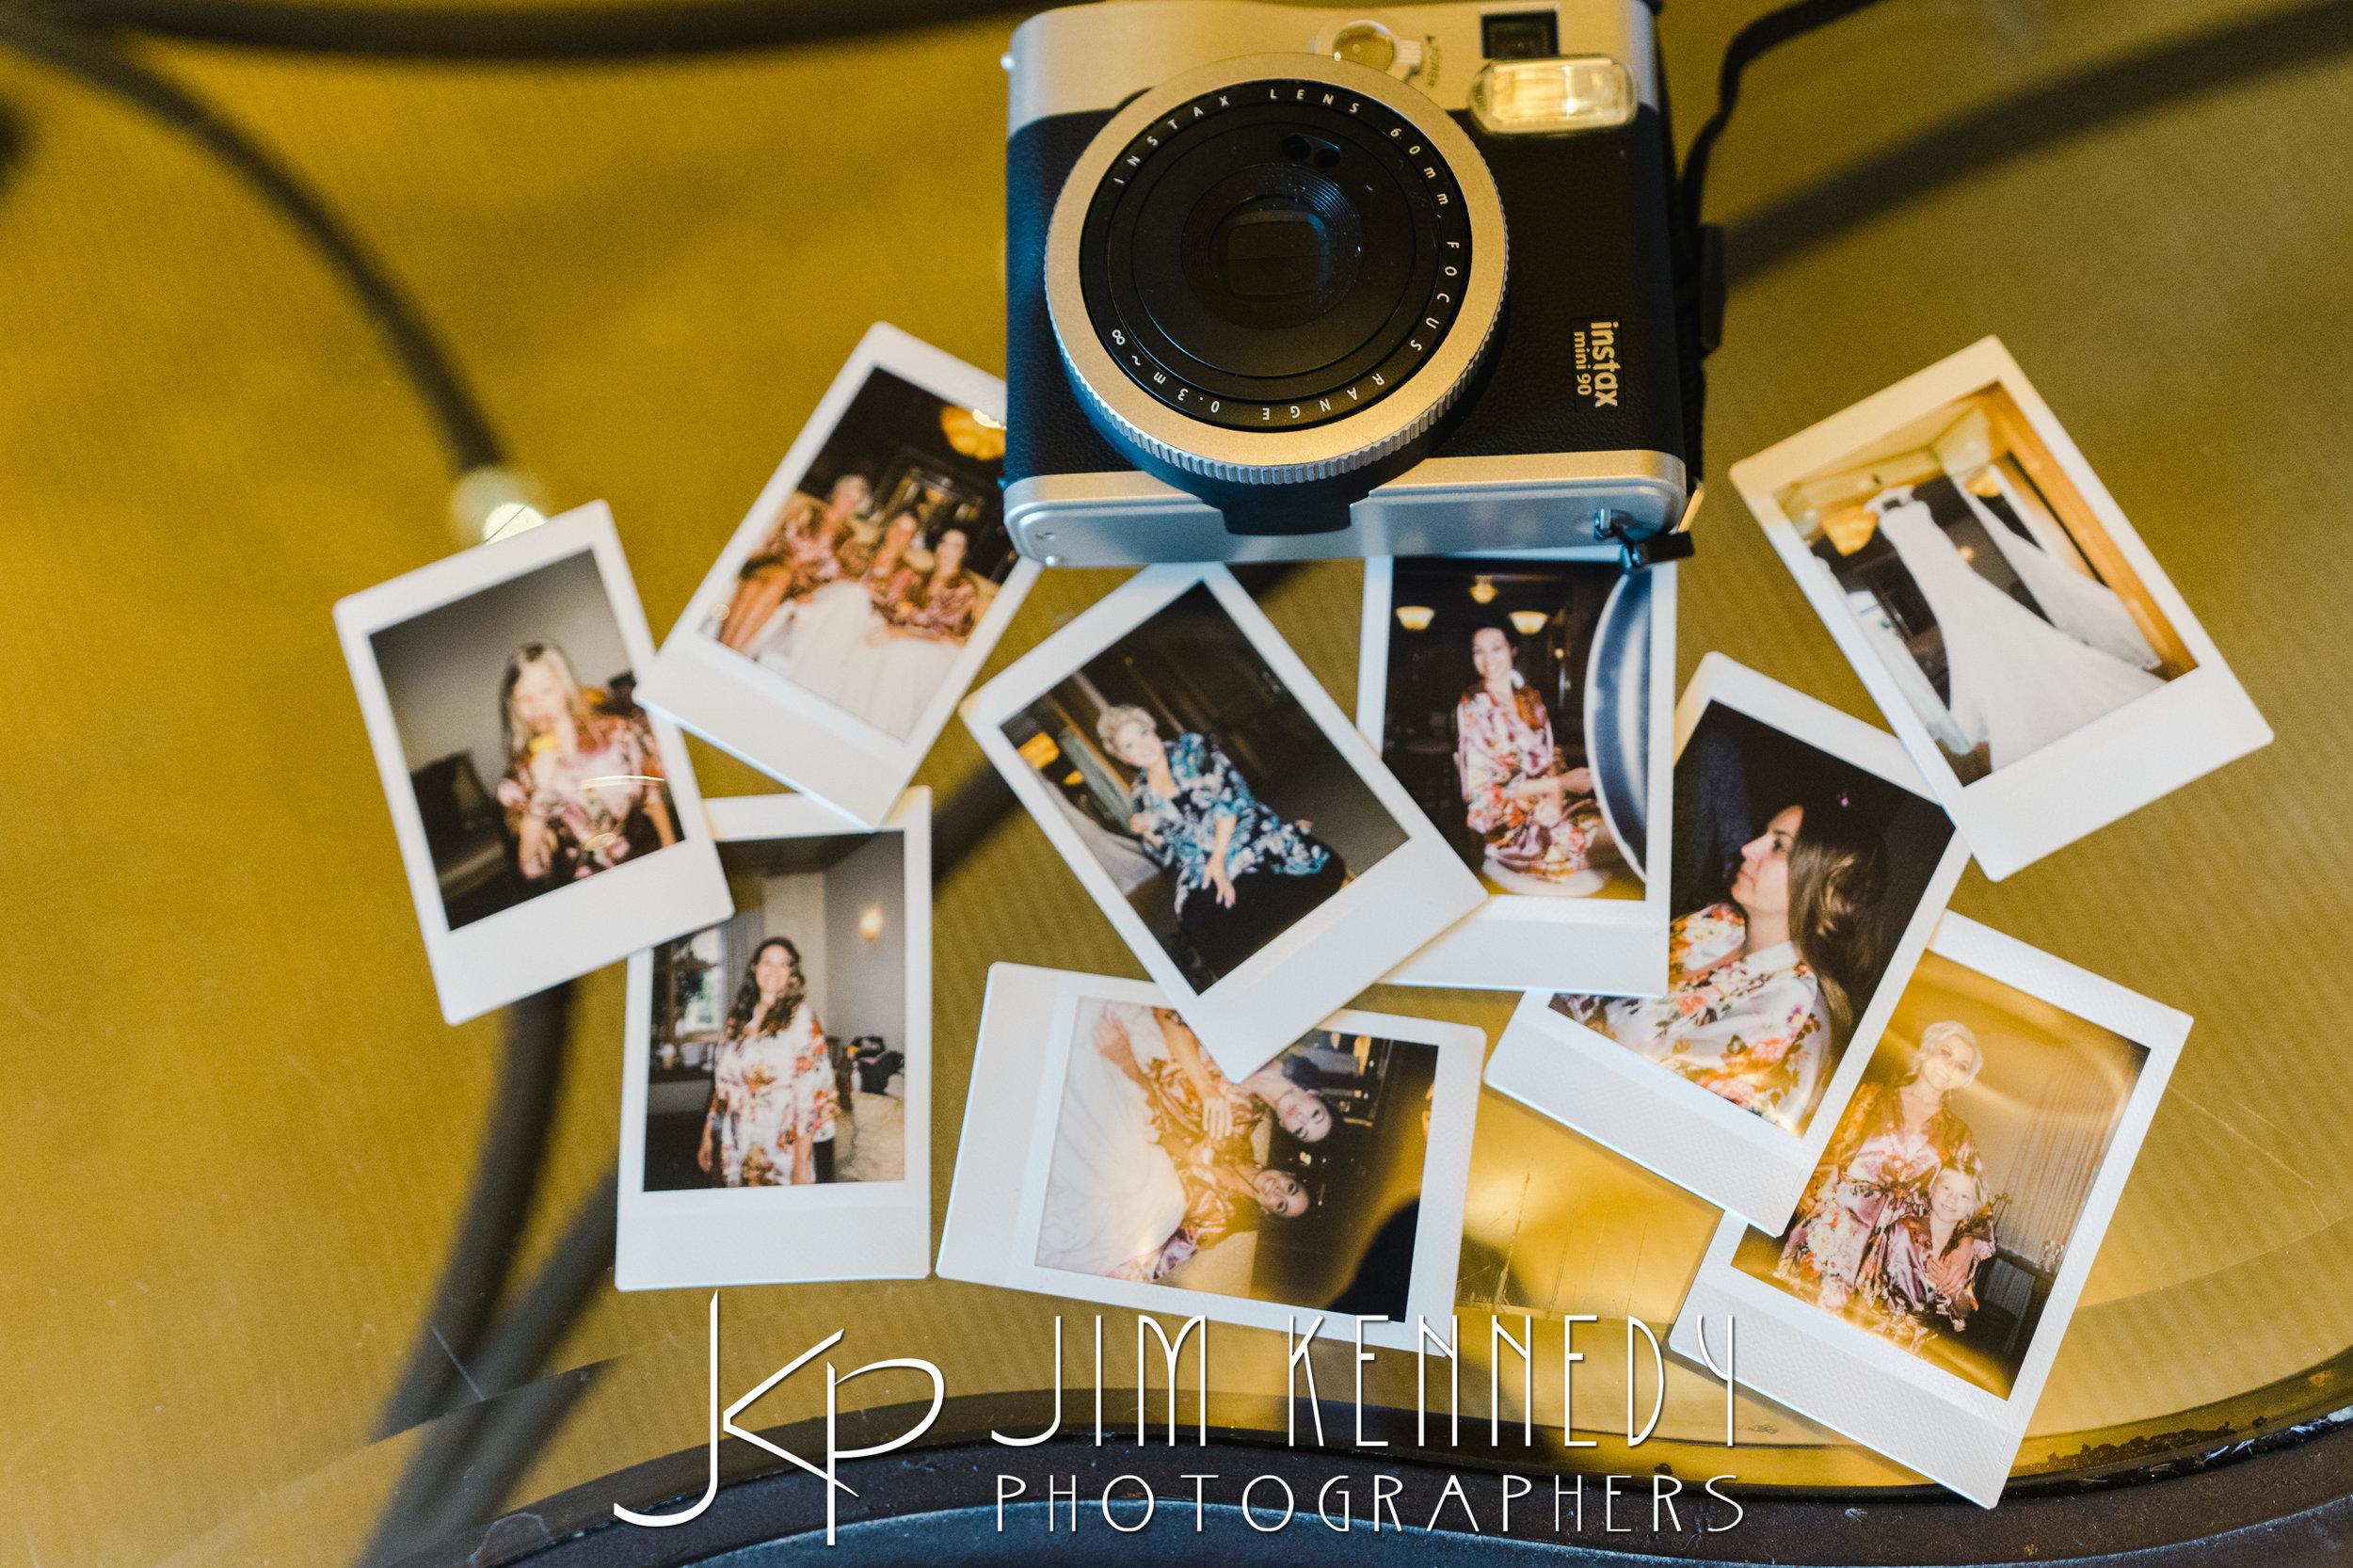 pelican-hill-wedding-jim-kenedy-photographers_0003.JPG